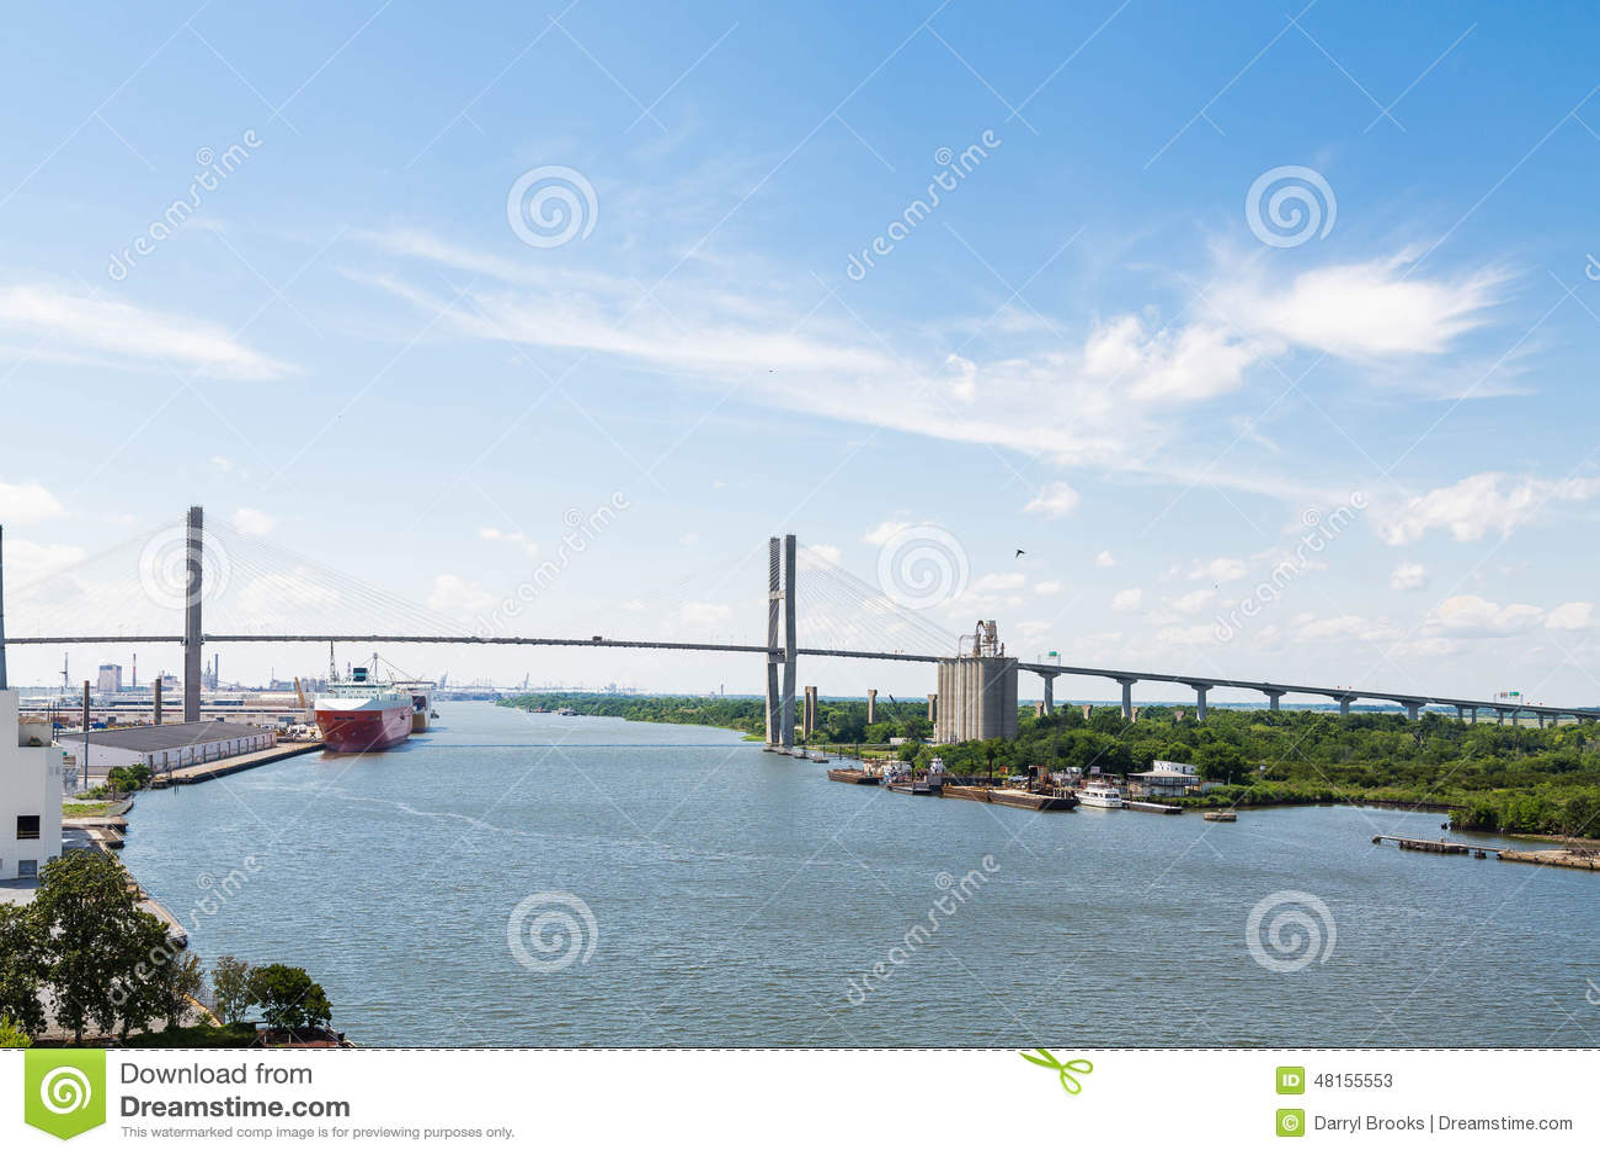 Висячий мост над портом доставки